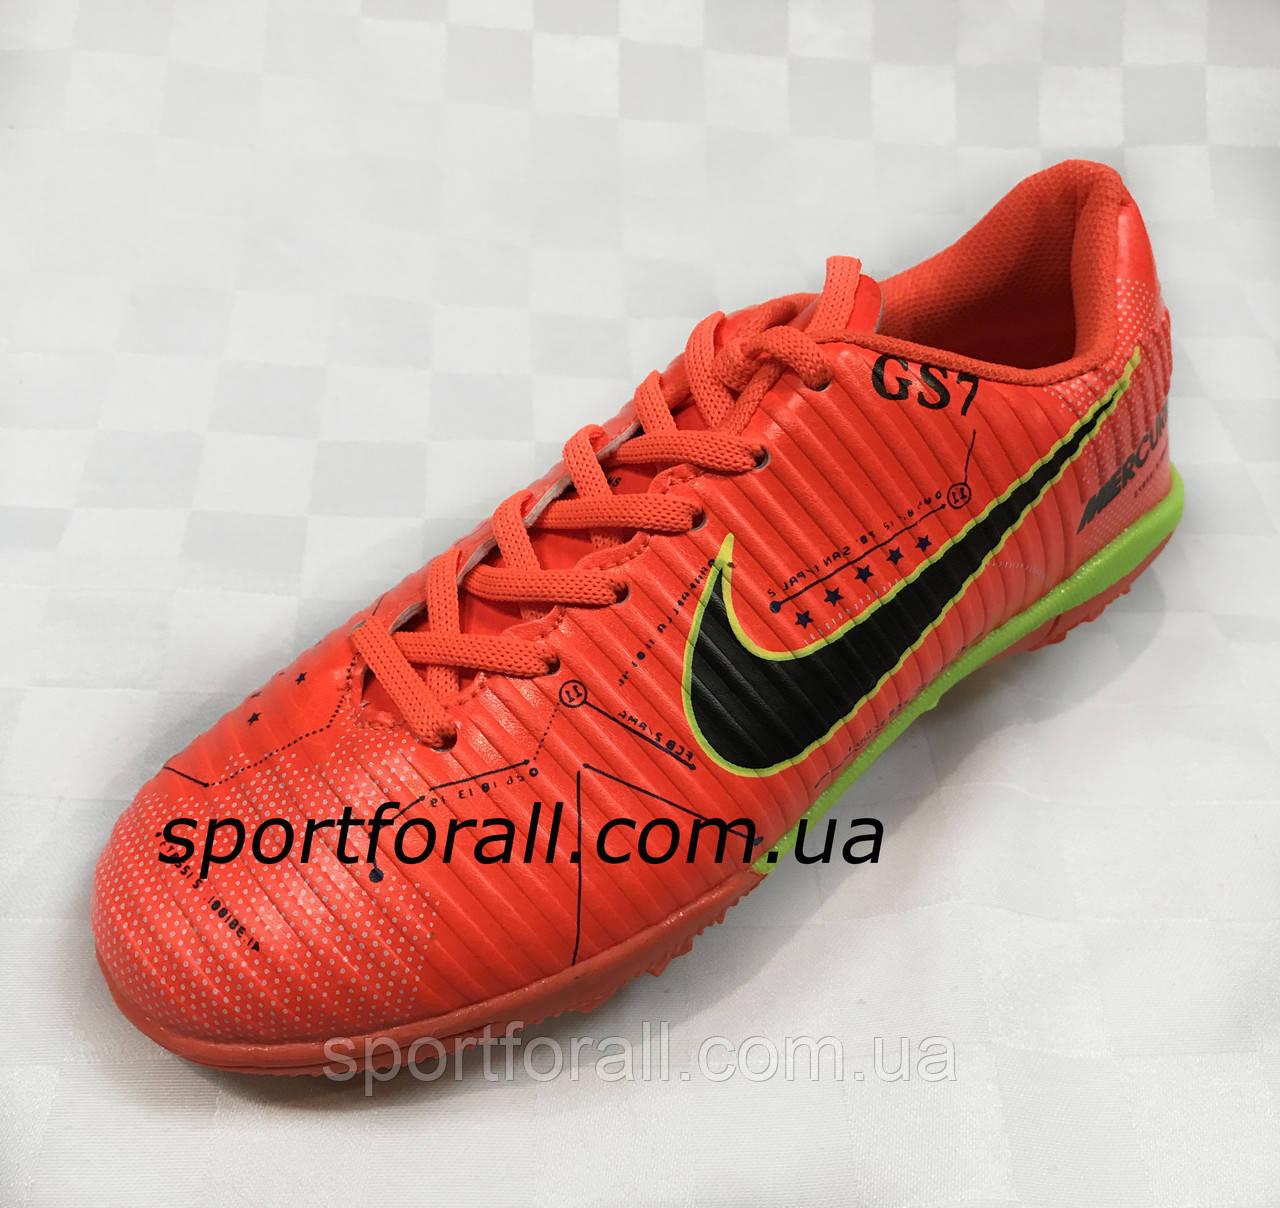 4a439b1a Сороконожки Nike MERCURIAL X GS7 Р 31-36(оранжевые) 34-21,5см — в ...